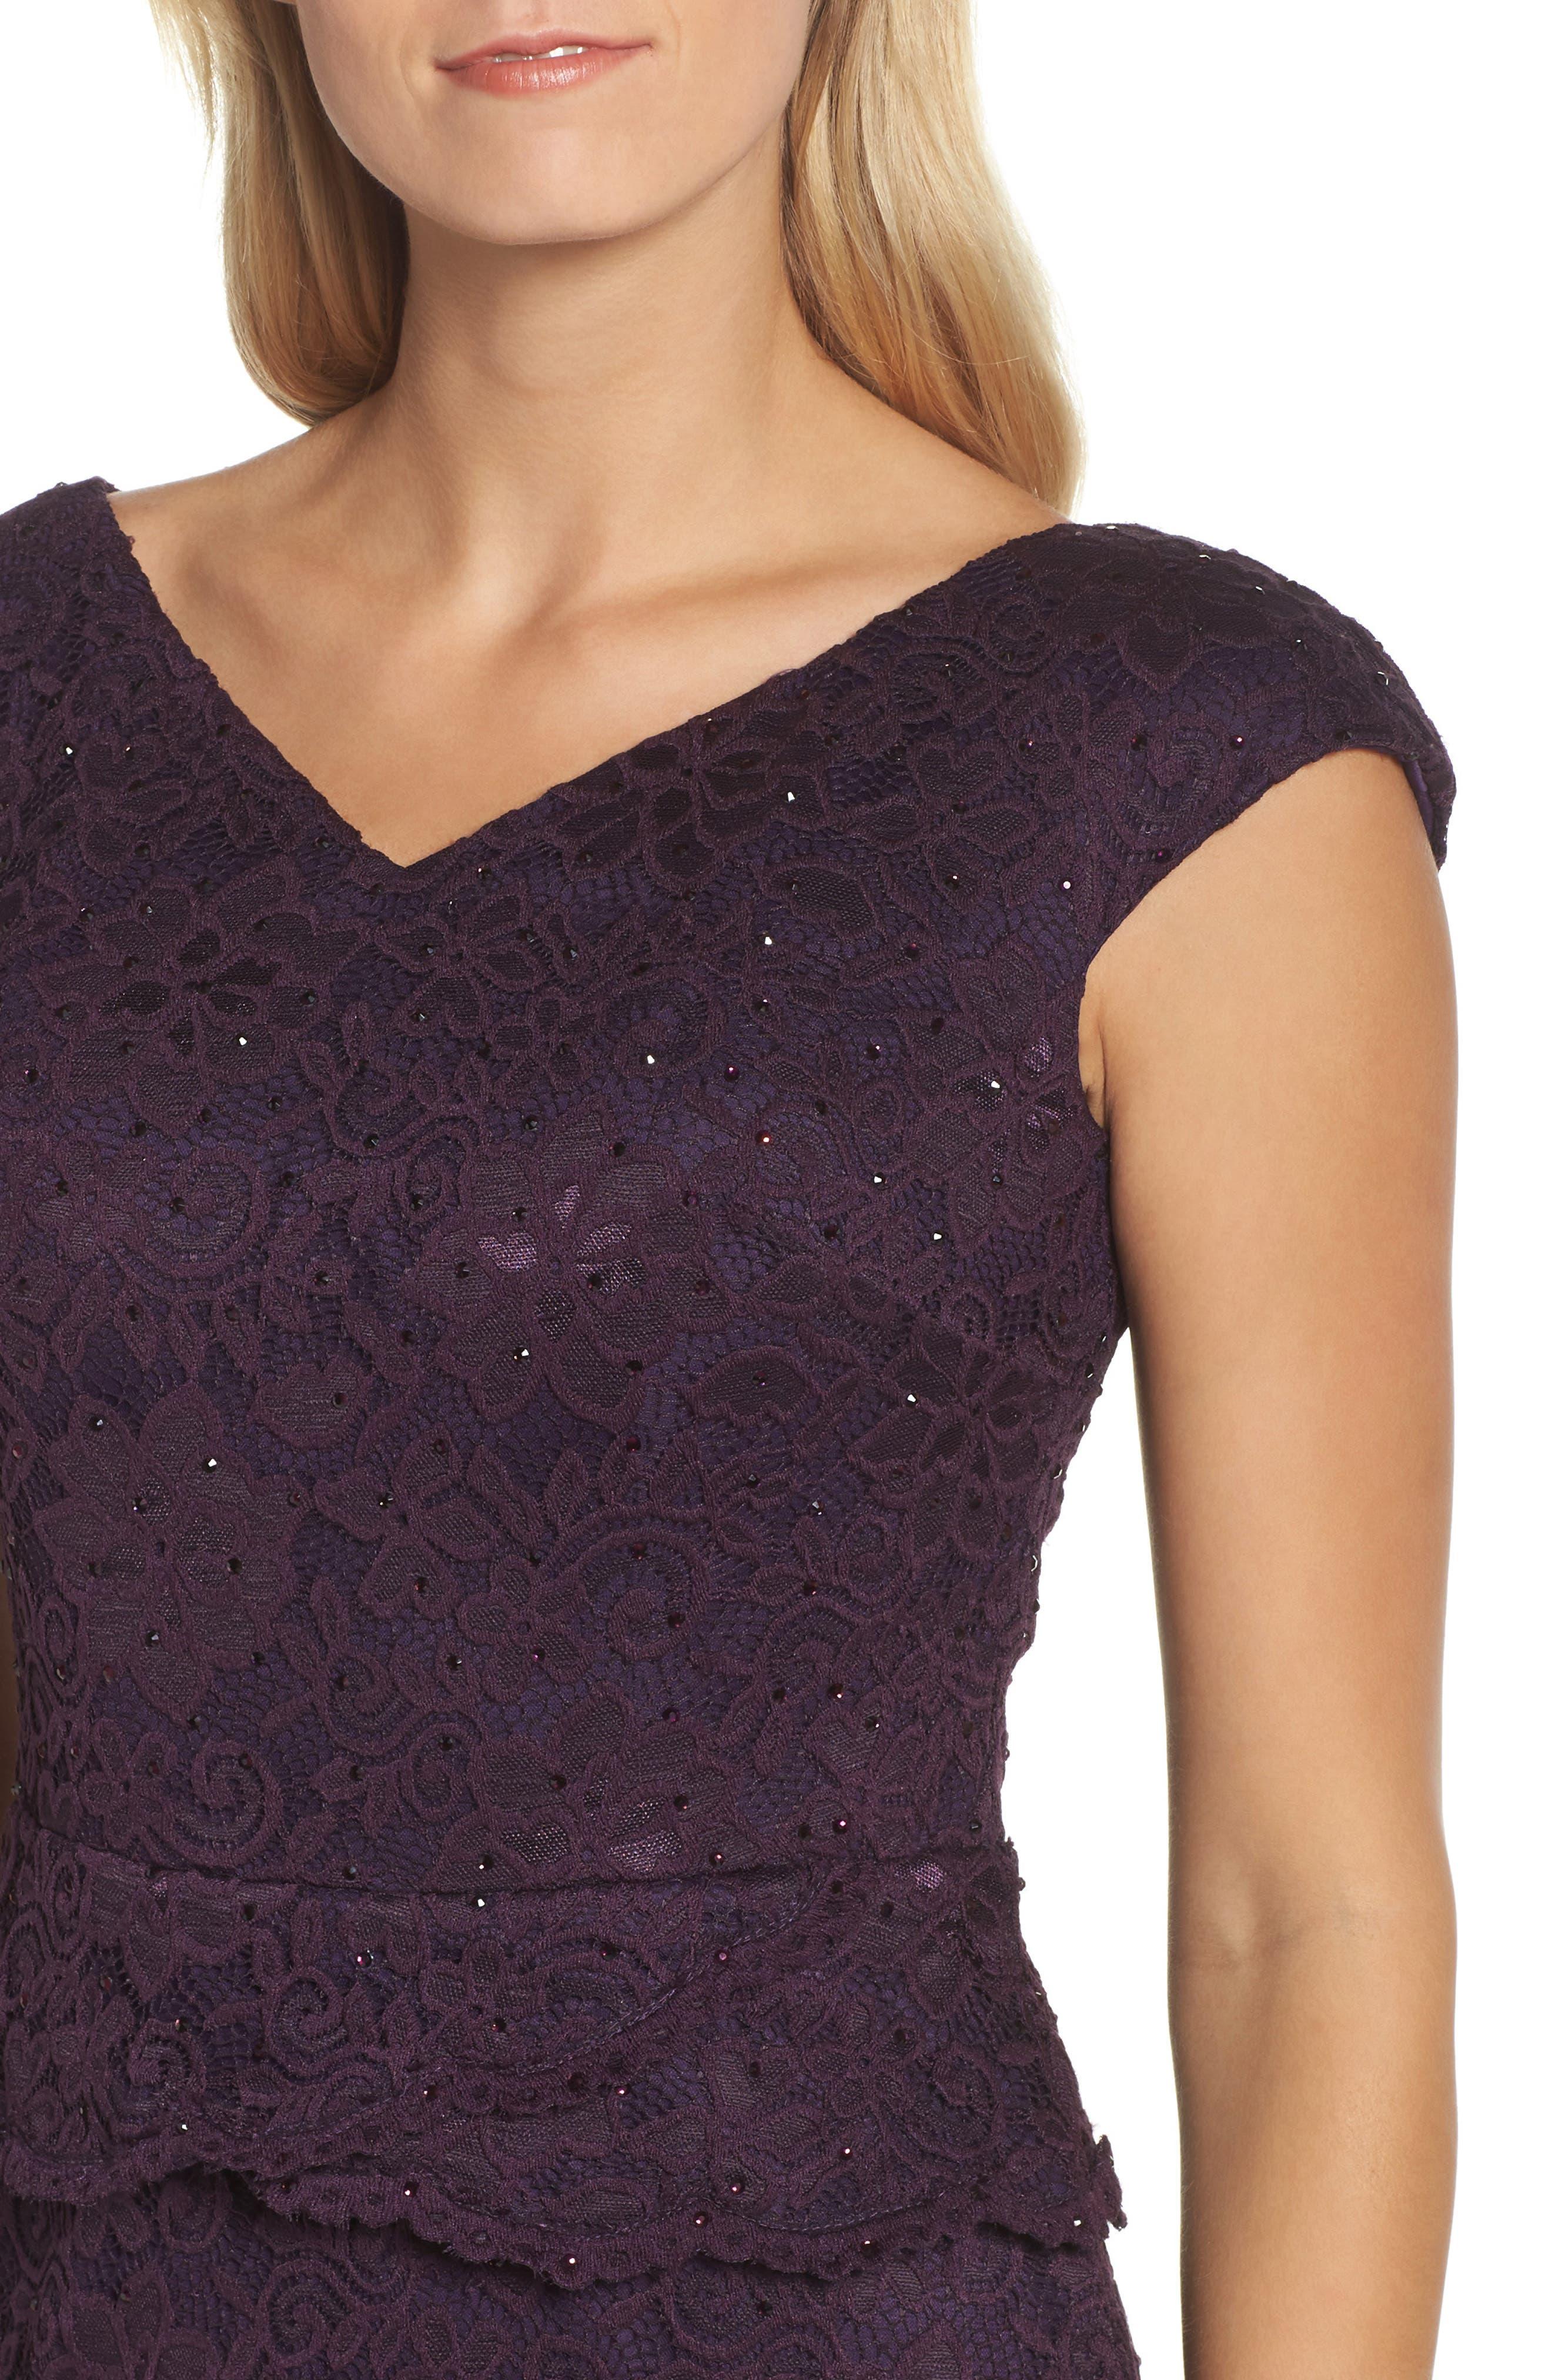 LA FEMME, Embellished Lace Sheath Dress, Alternate thumbnail 4, color, 501